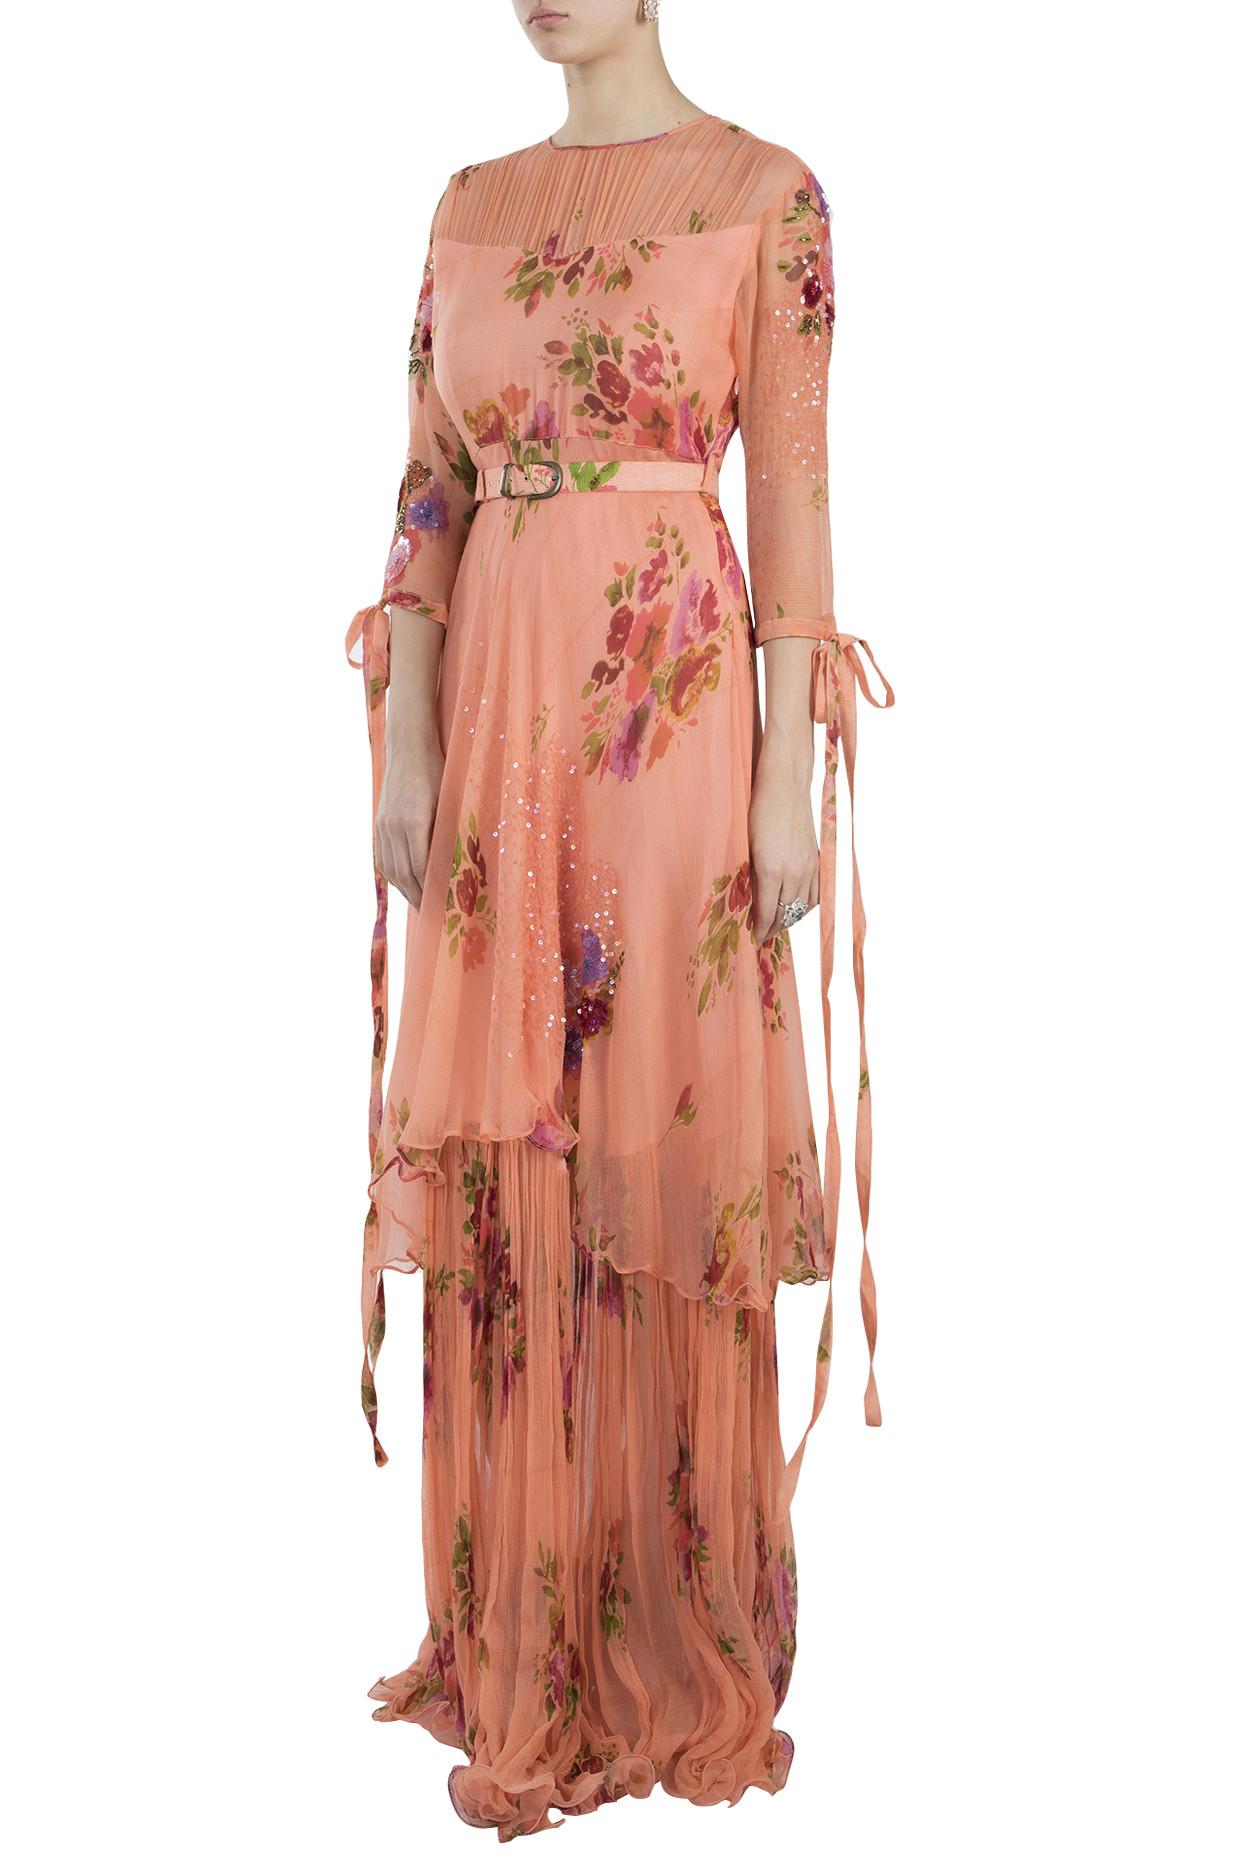 Peach Printed Layered Maxi Dress With Belt by Pallavi Jaipur